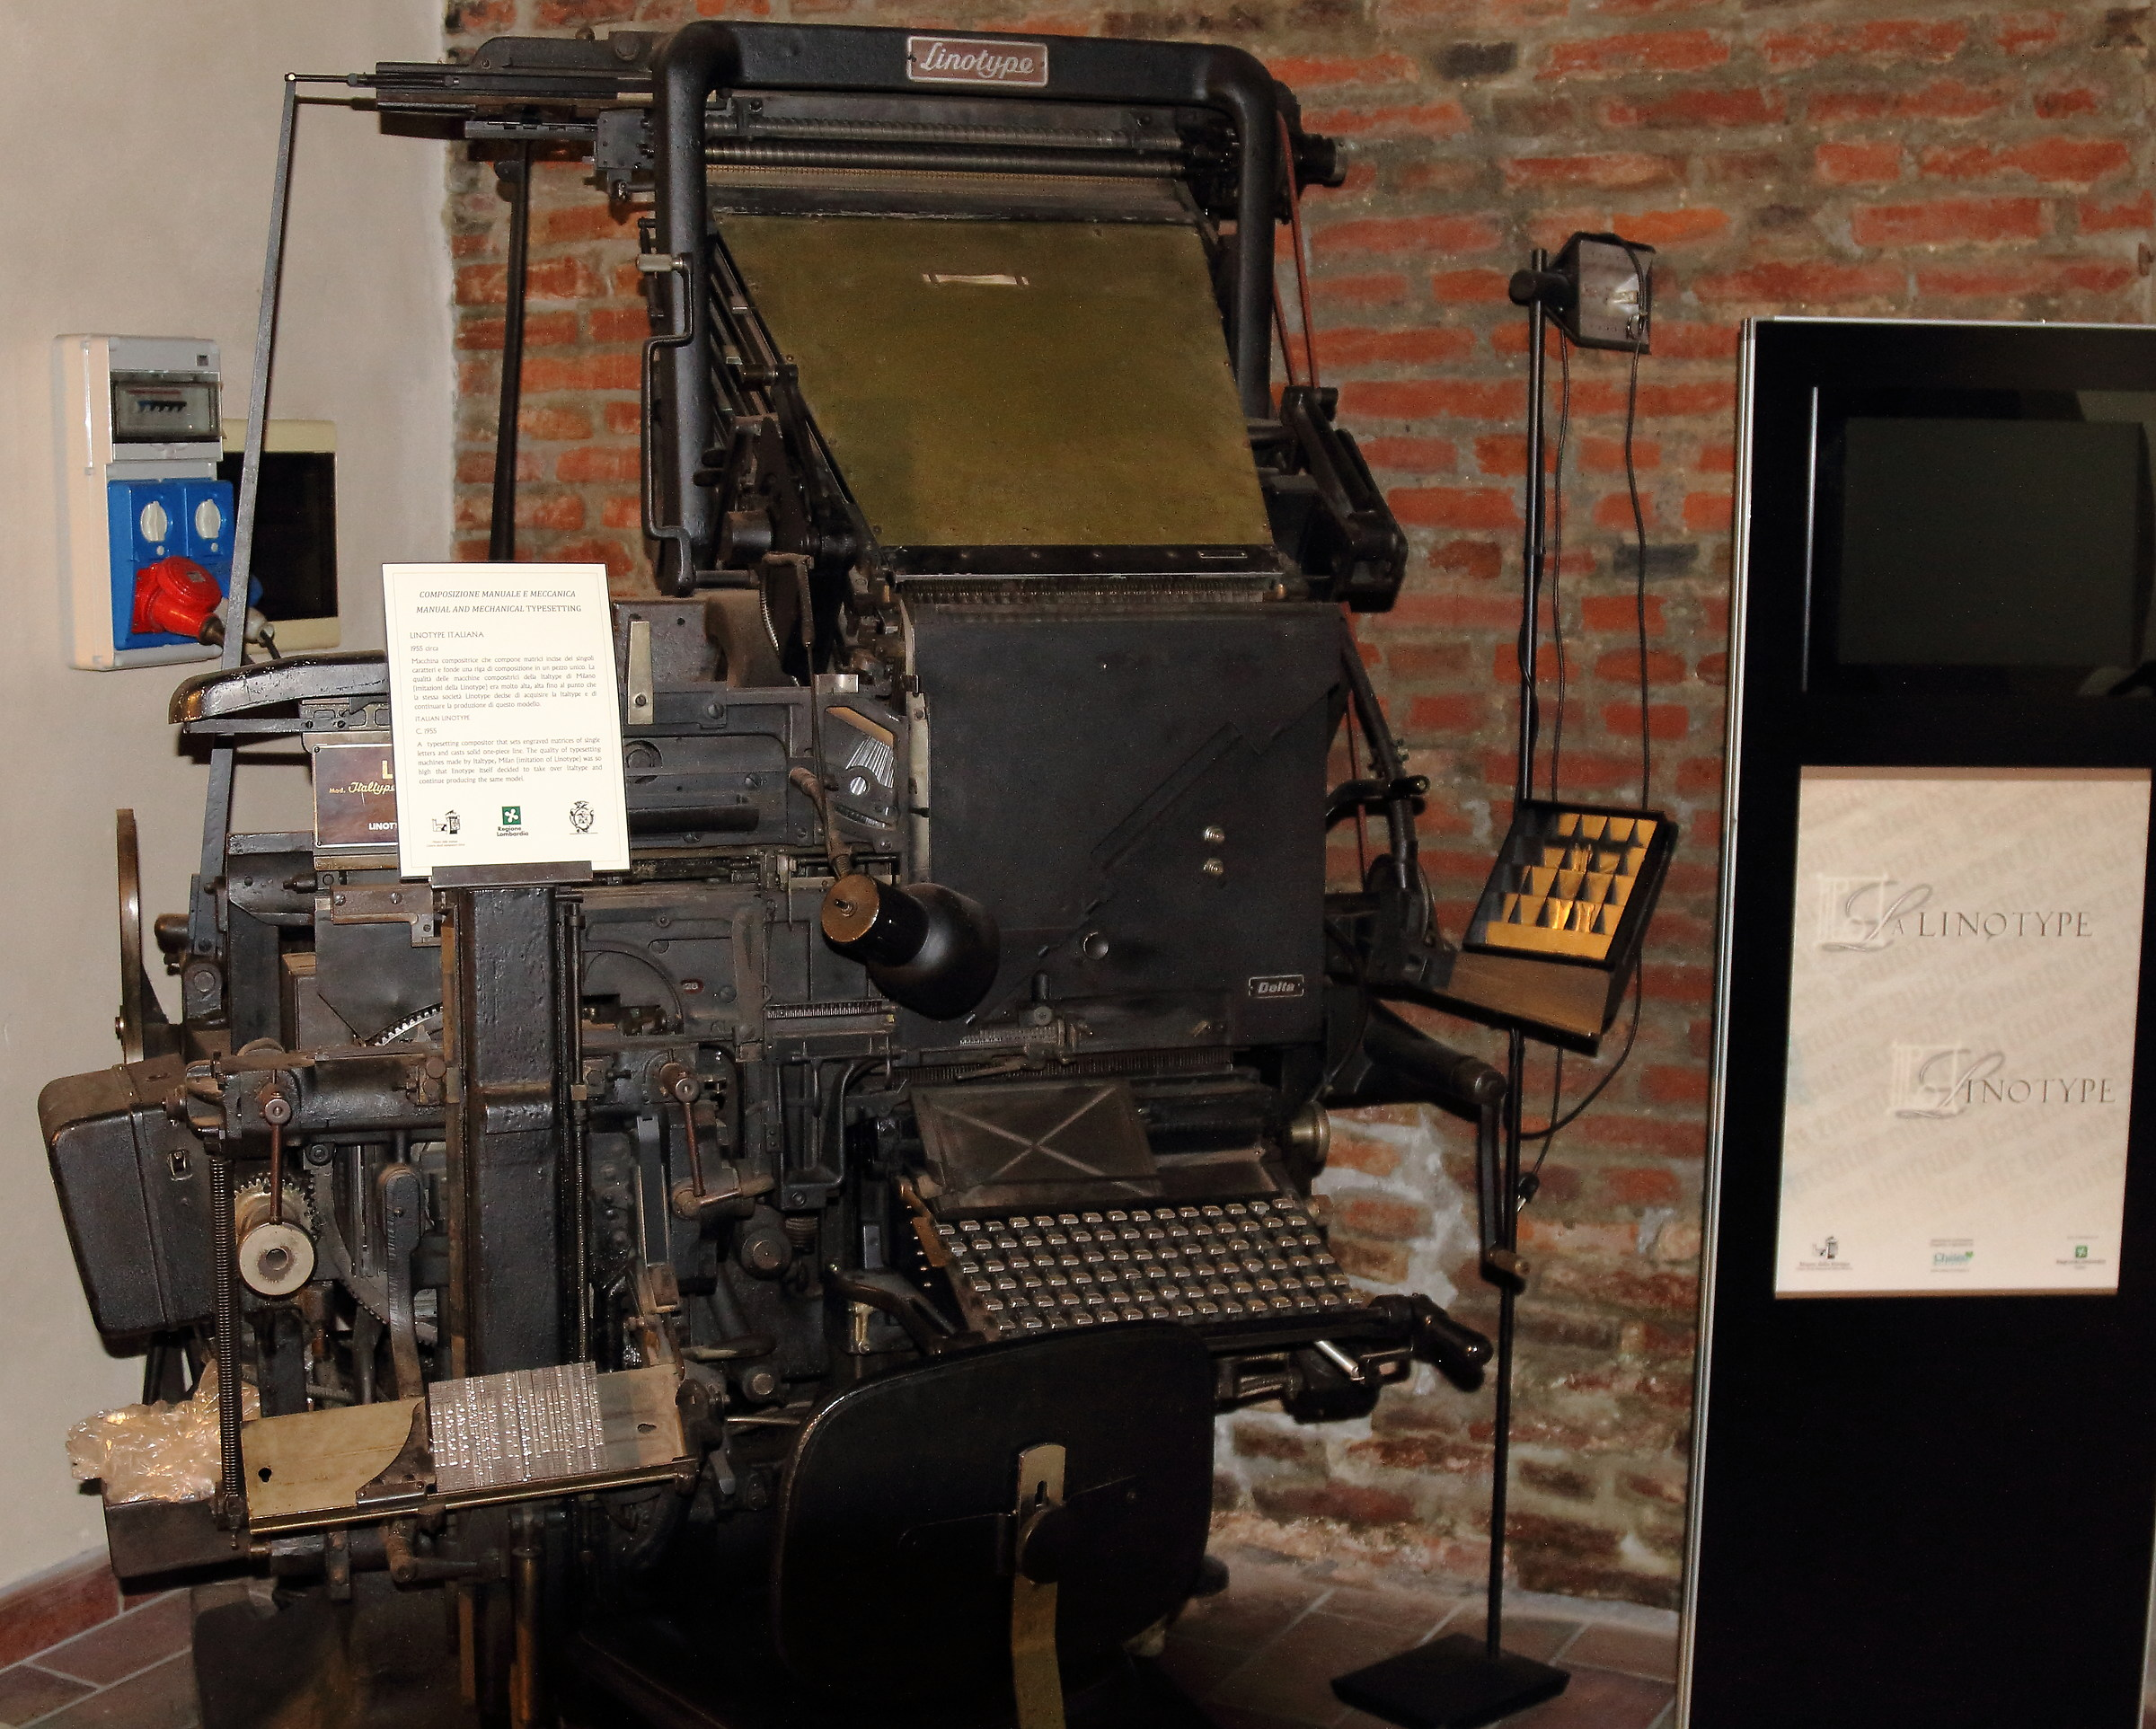 Linotype ...